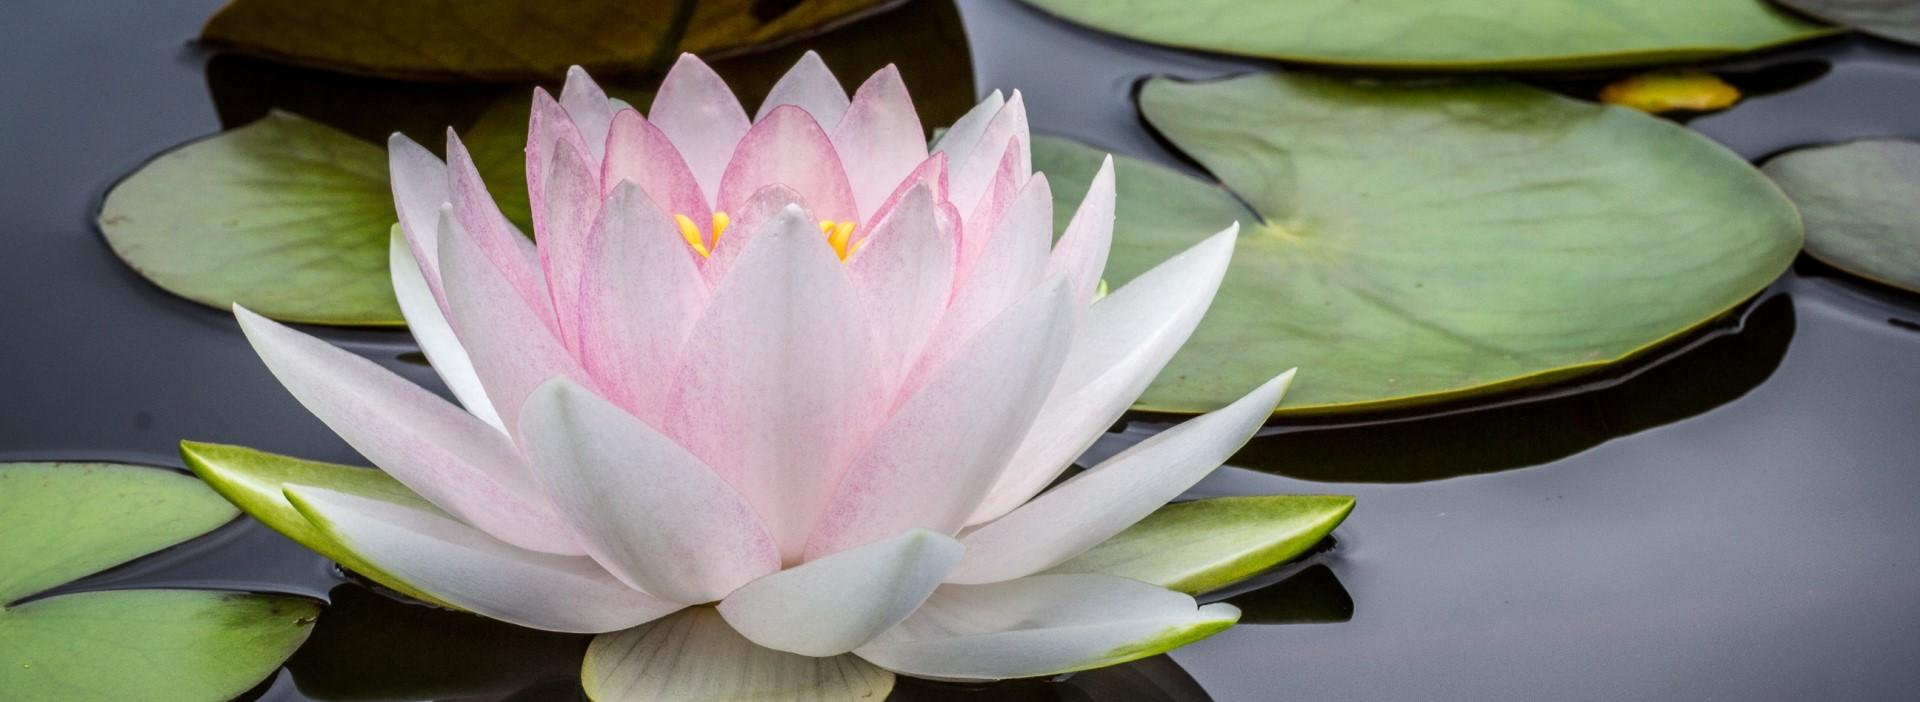 lotus blossom representing restorative yoga